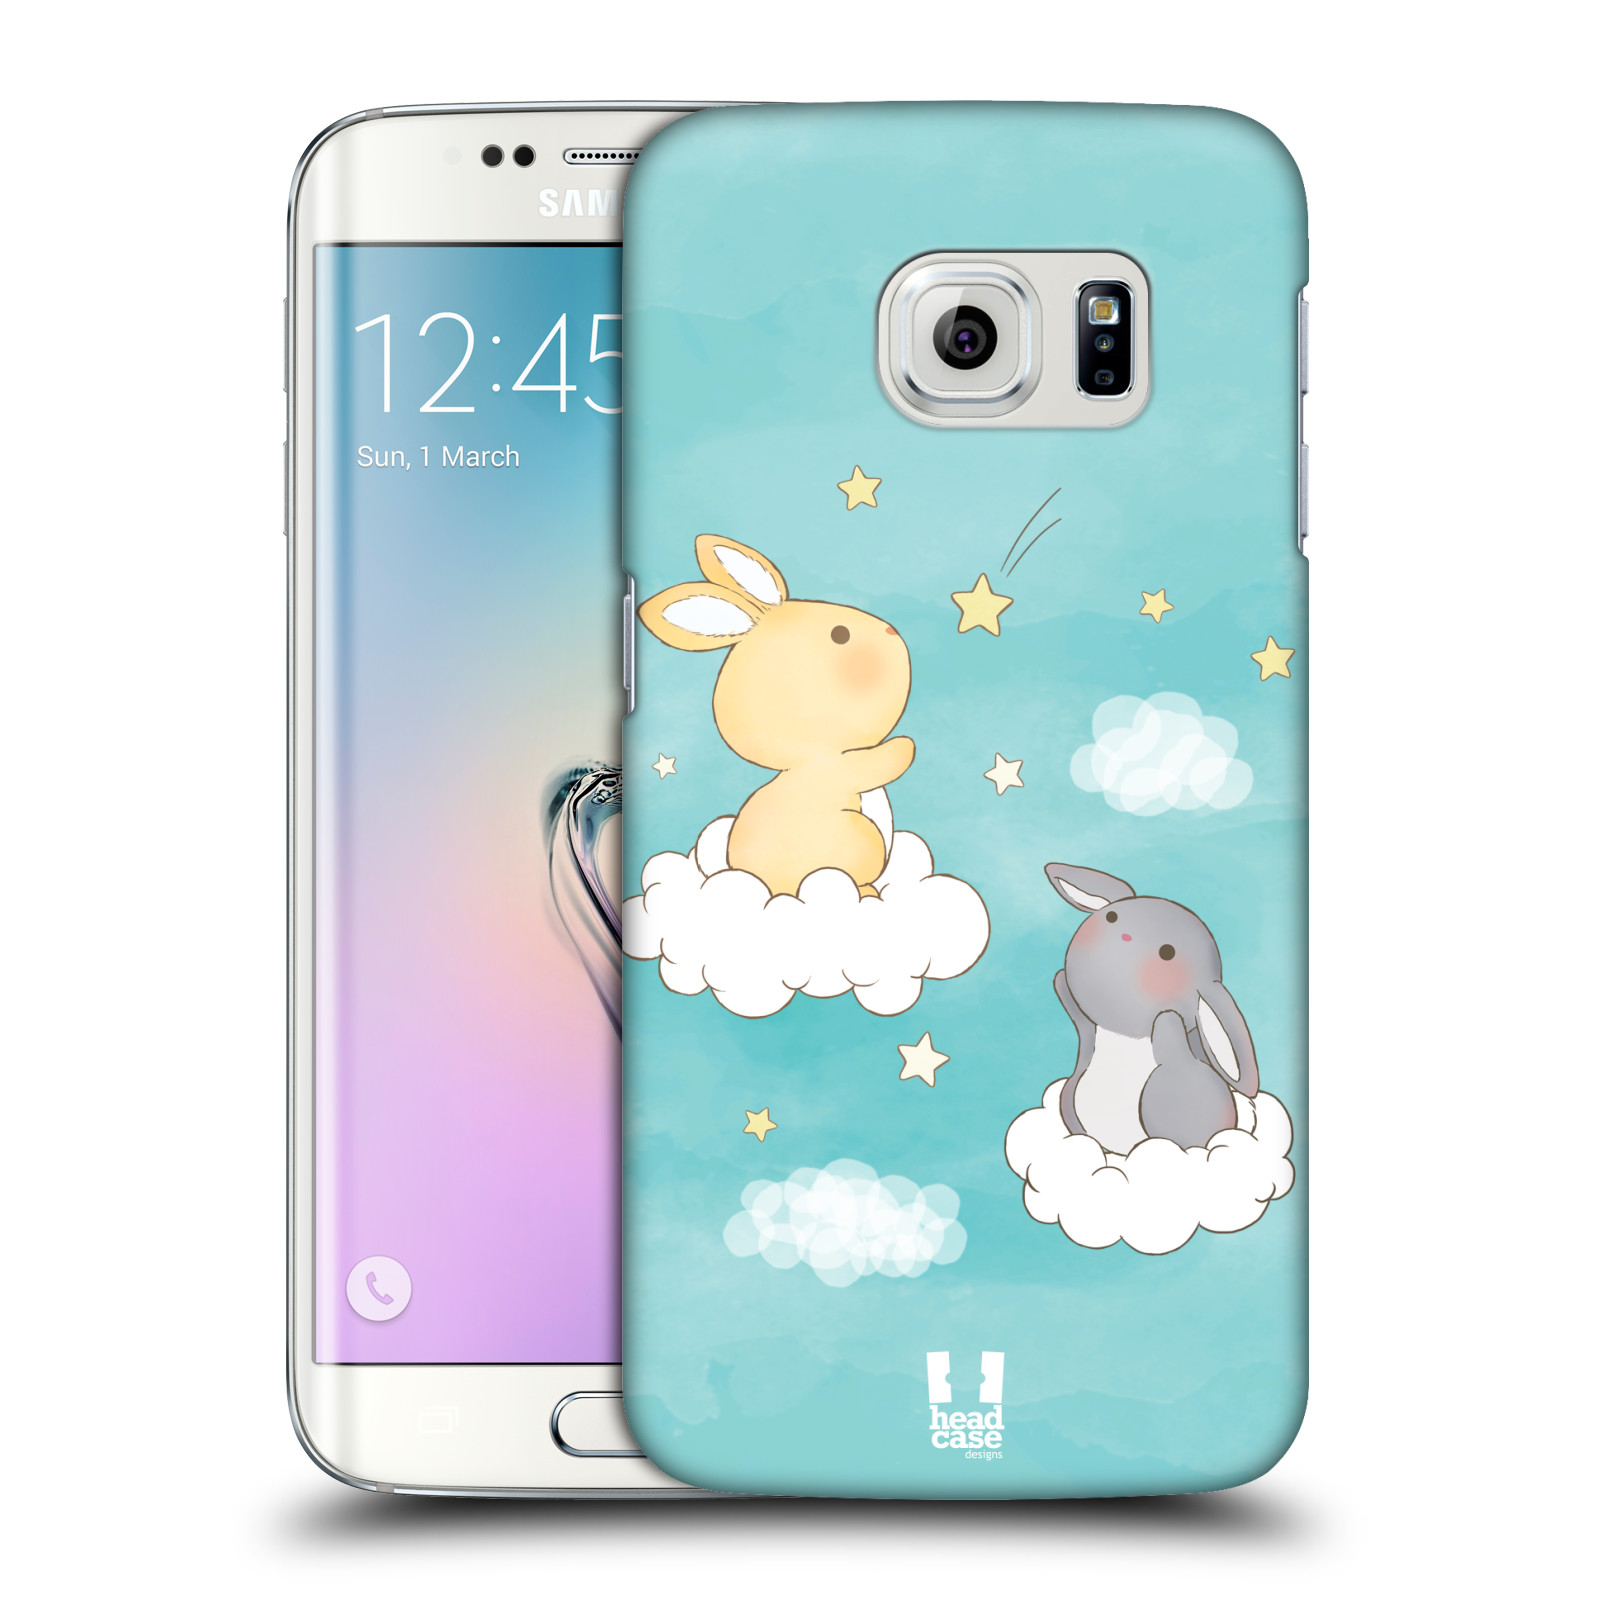 HEAD CASE plastový obal na mobil SAMSUNG Galaxy S6 EDGE (G9250, G925, G925F) vzor králíček a hvězdy modrá